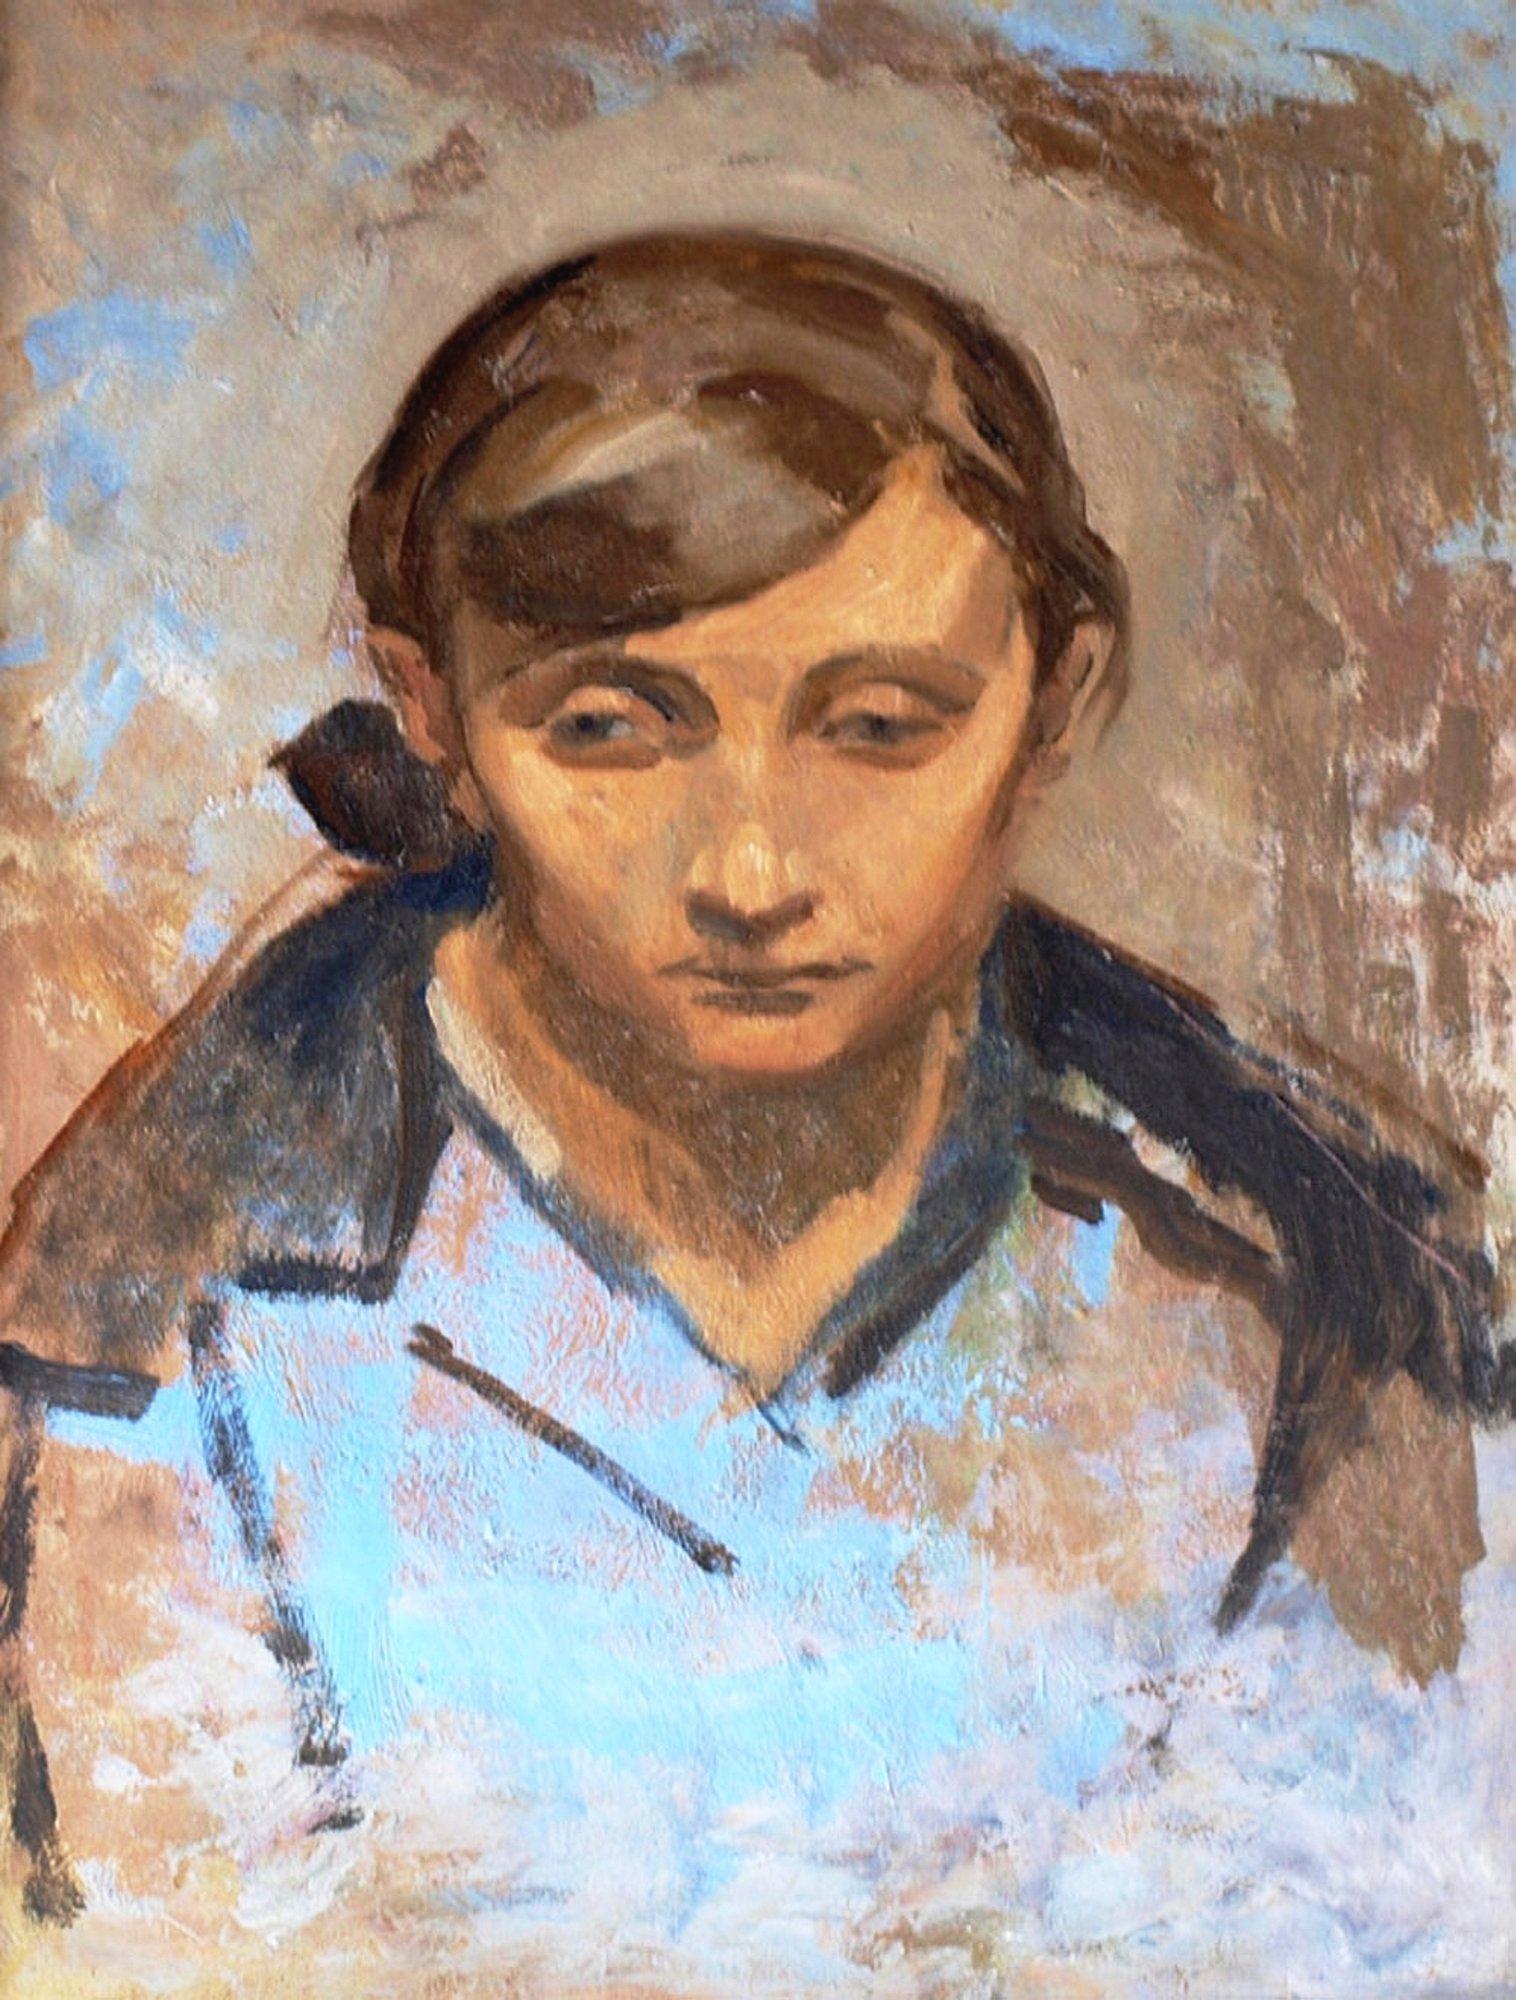 Portret młodej kobiety – Ireny Nasalikównej